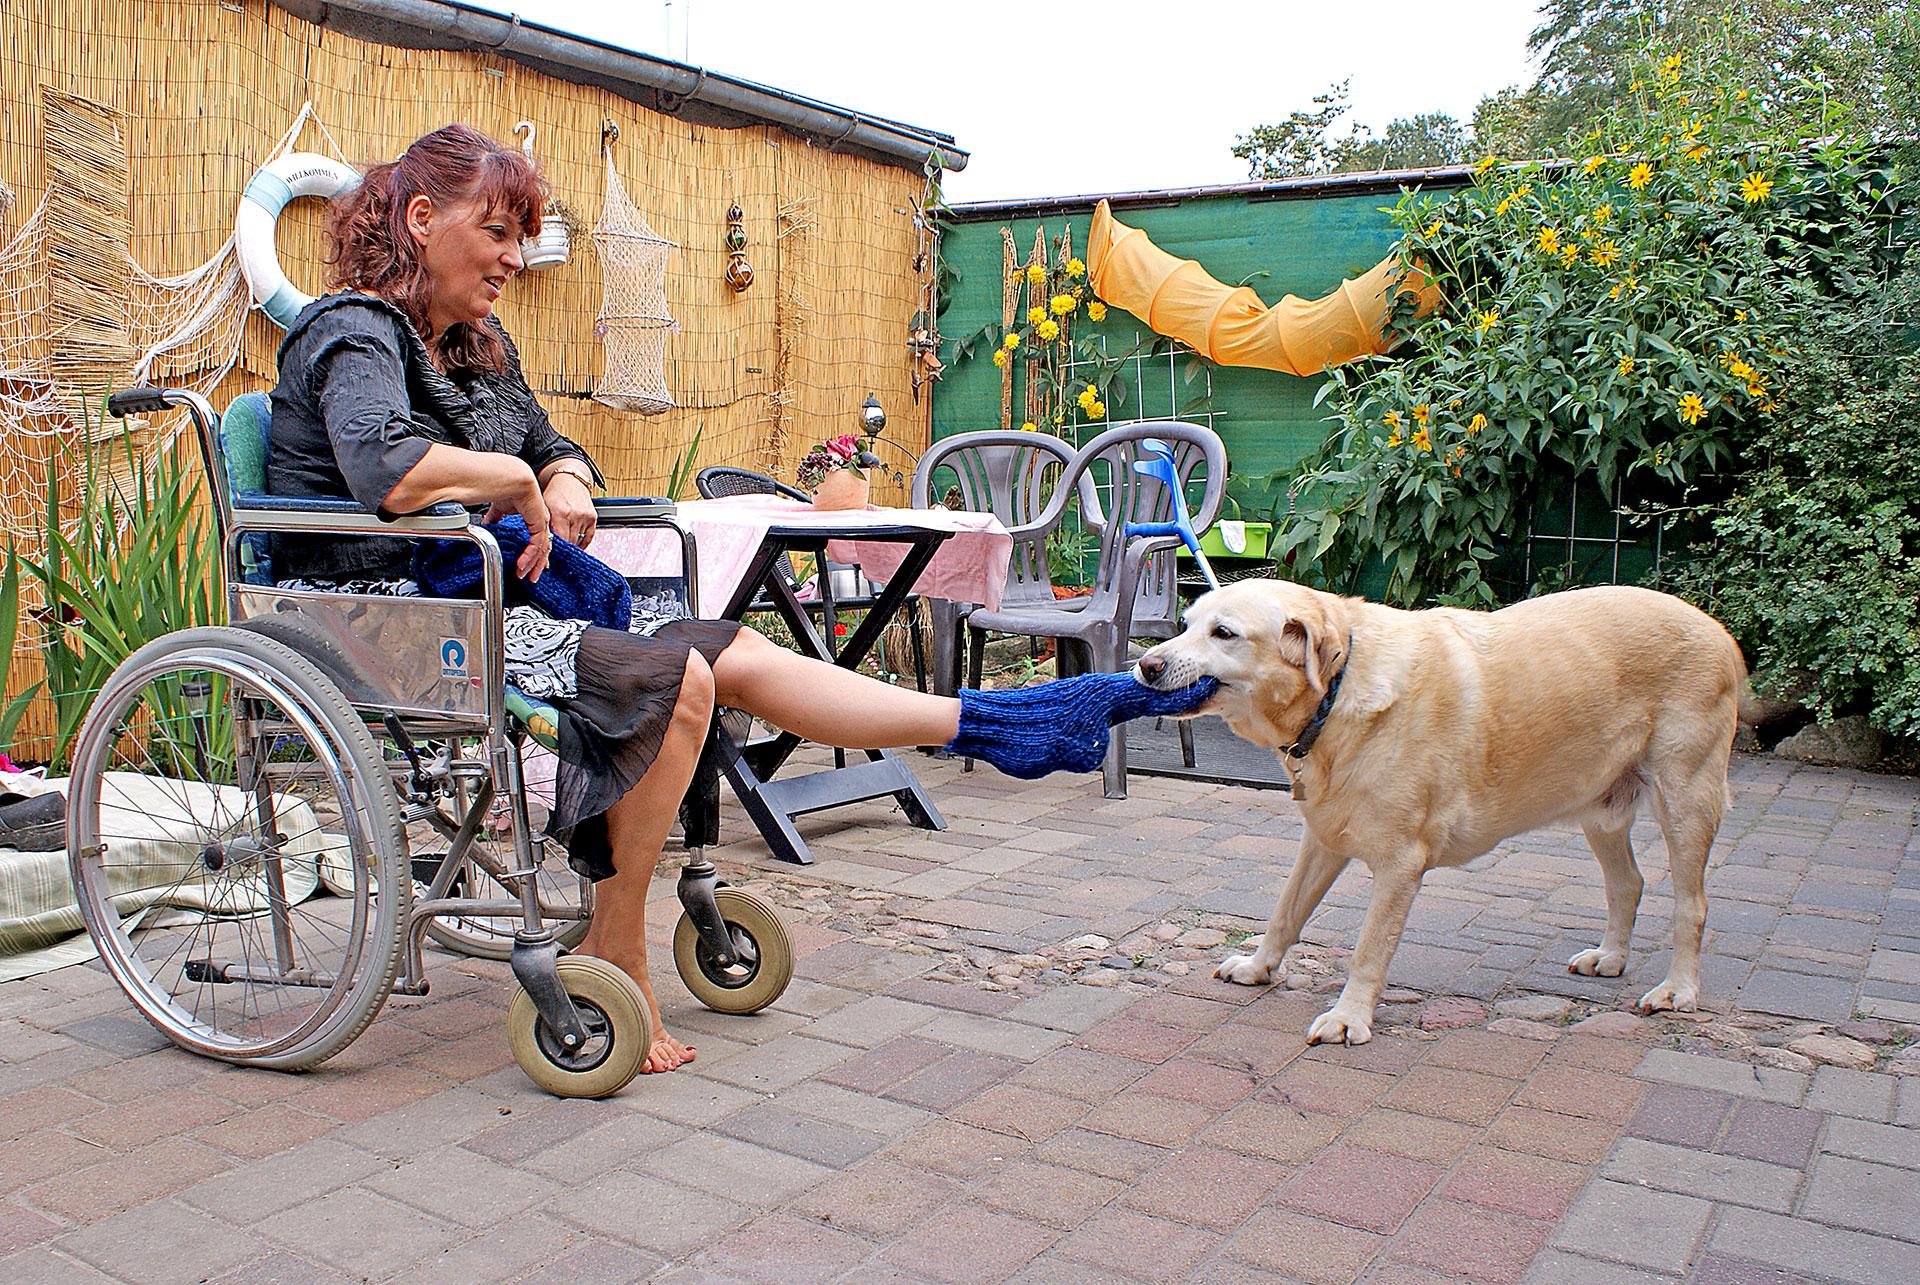 Karls hilft Hund Rollstuhlfahrerin